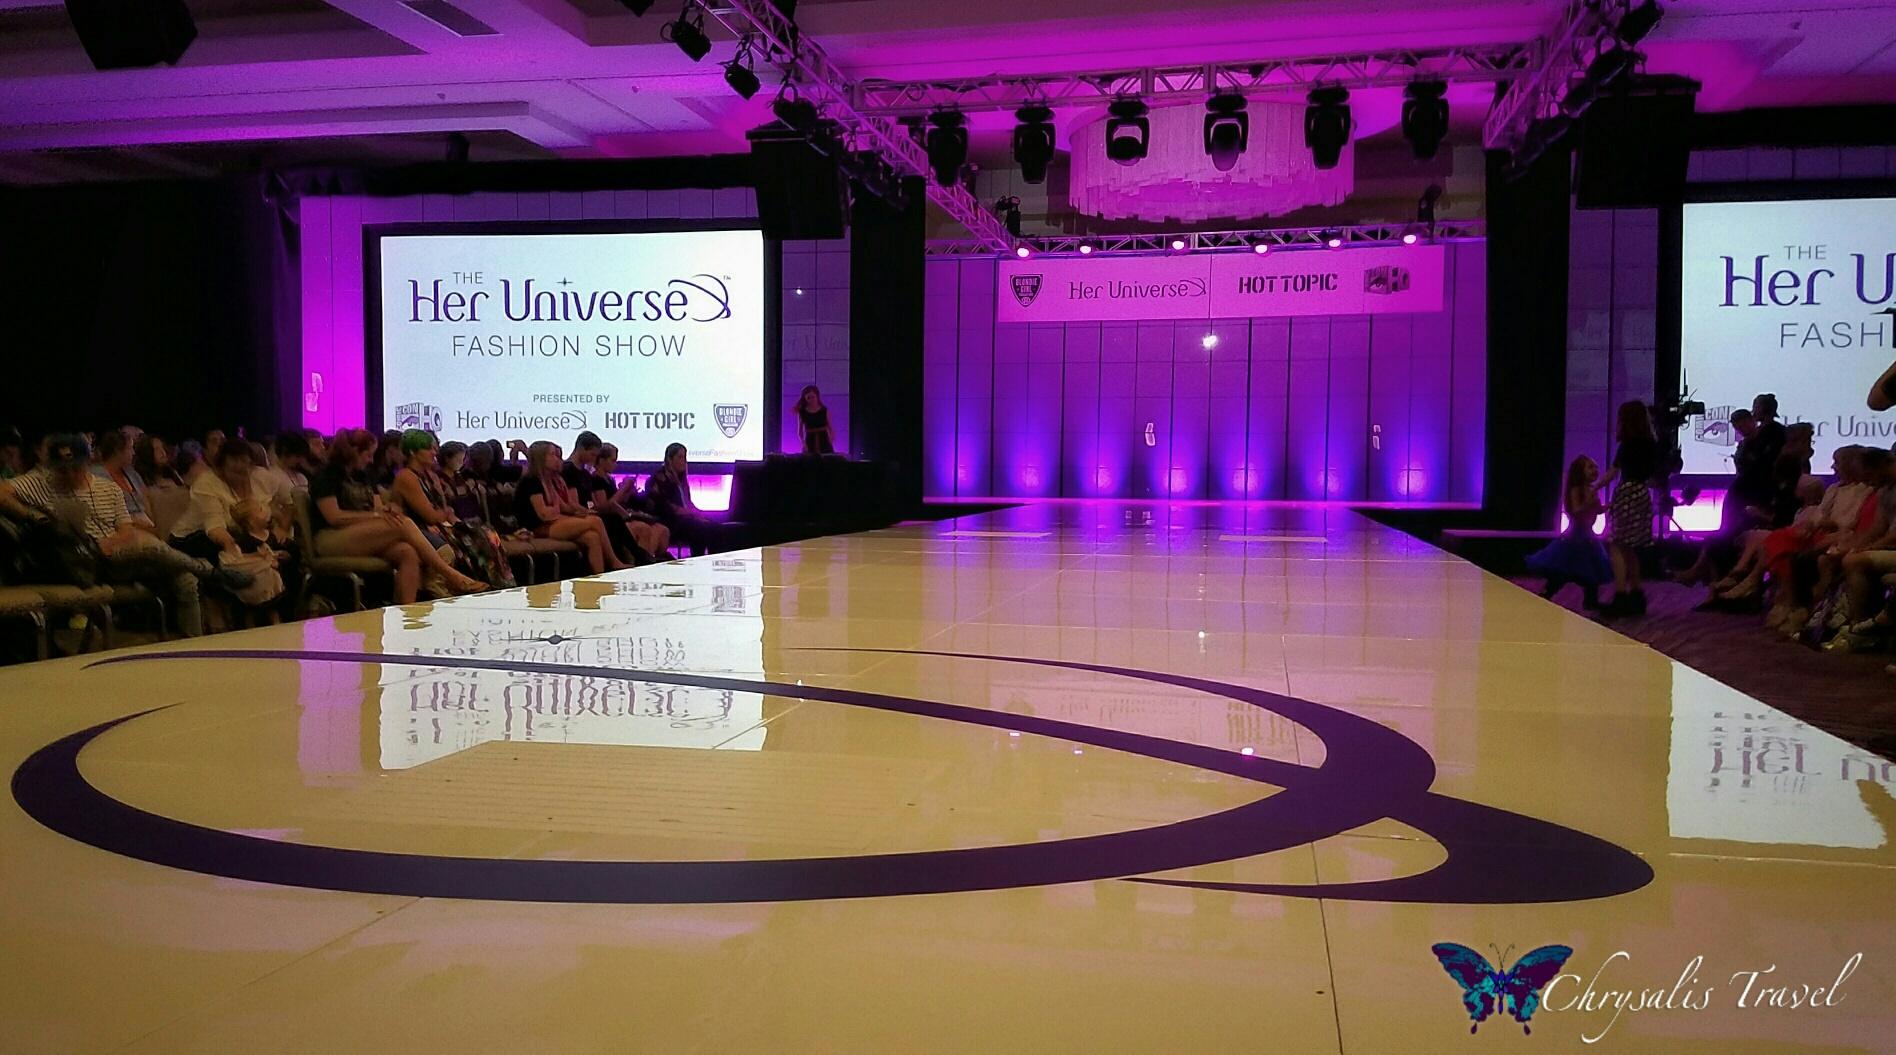 Her Universe Fashion Show Runway 2016